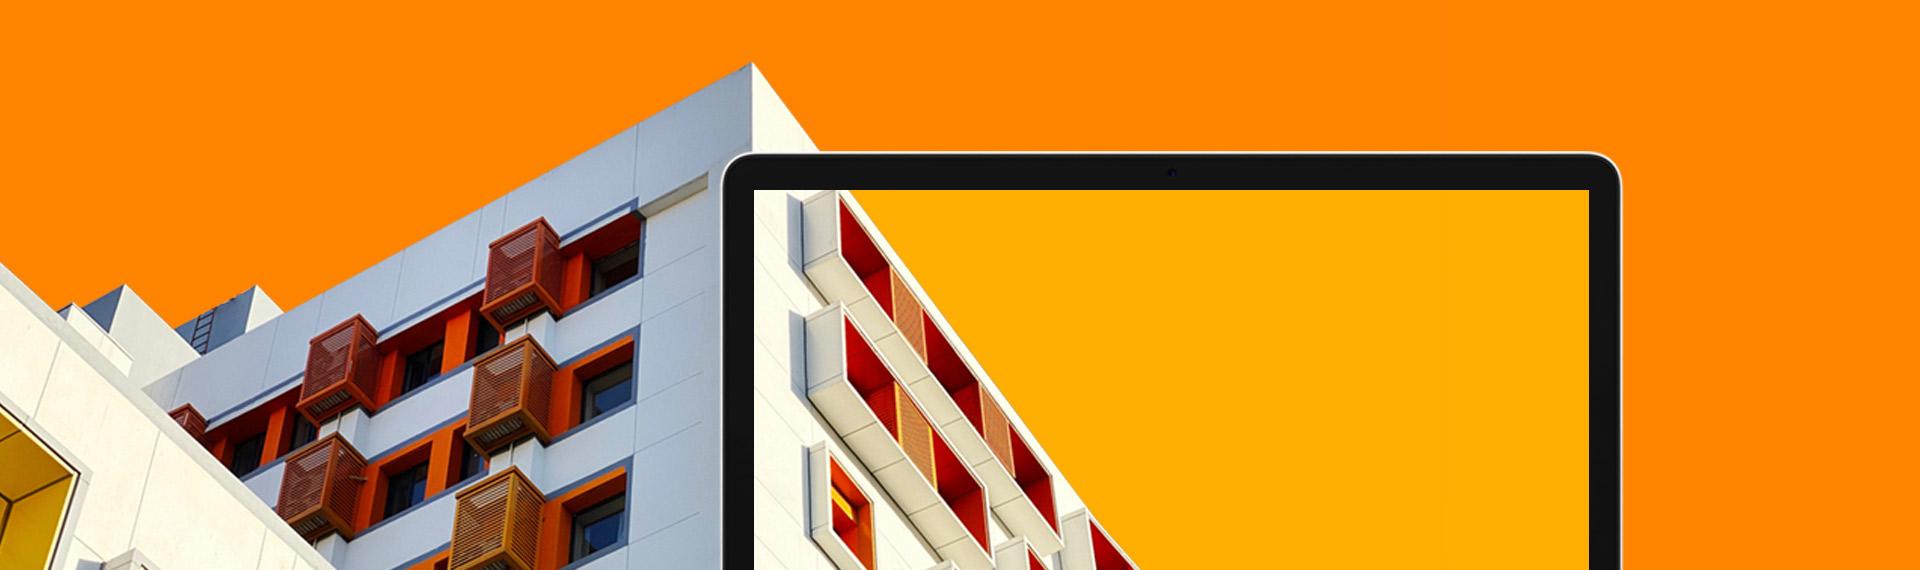 Real EstateThemes